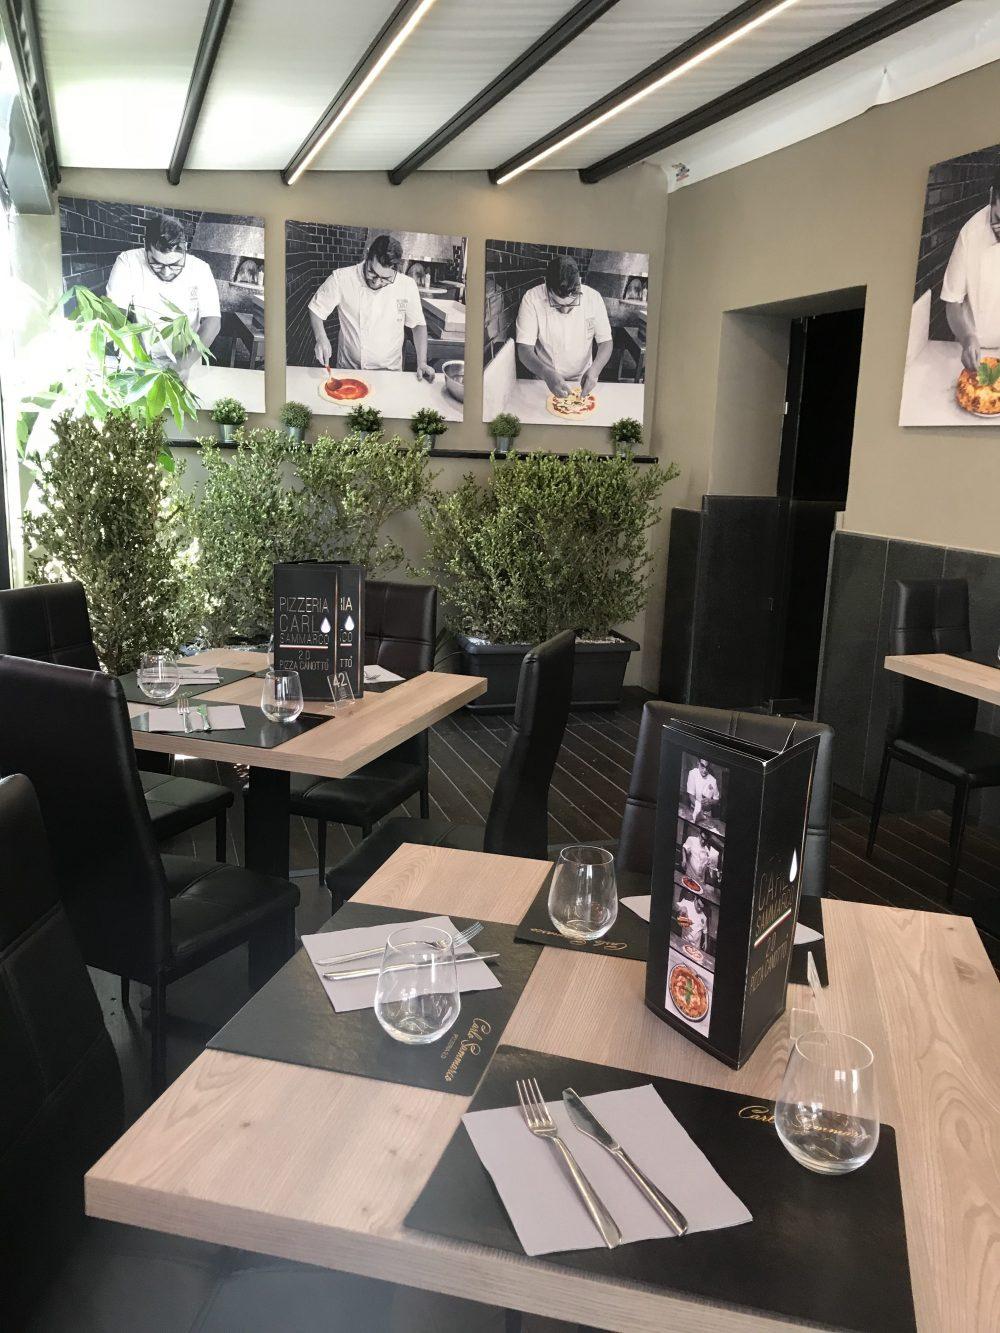 Pizzeria Carlo Sammarco 2.0 - Sala con giardino